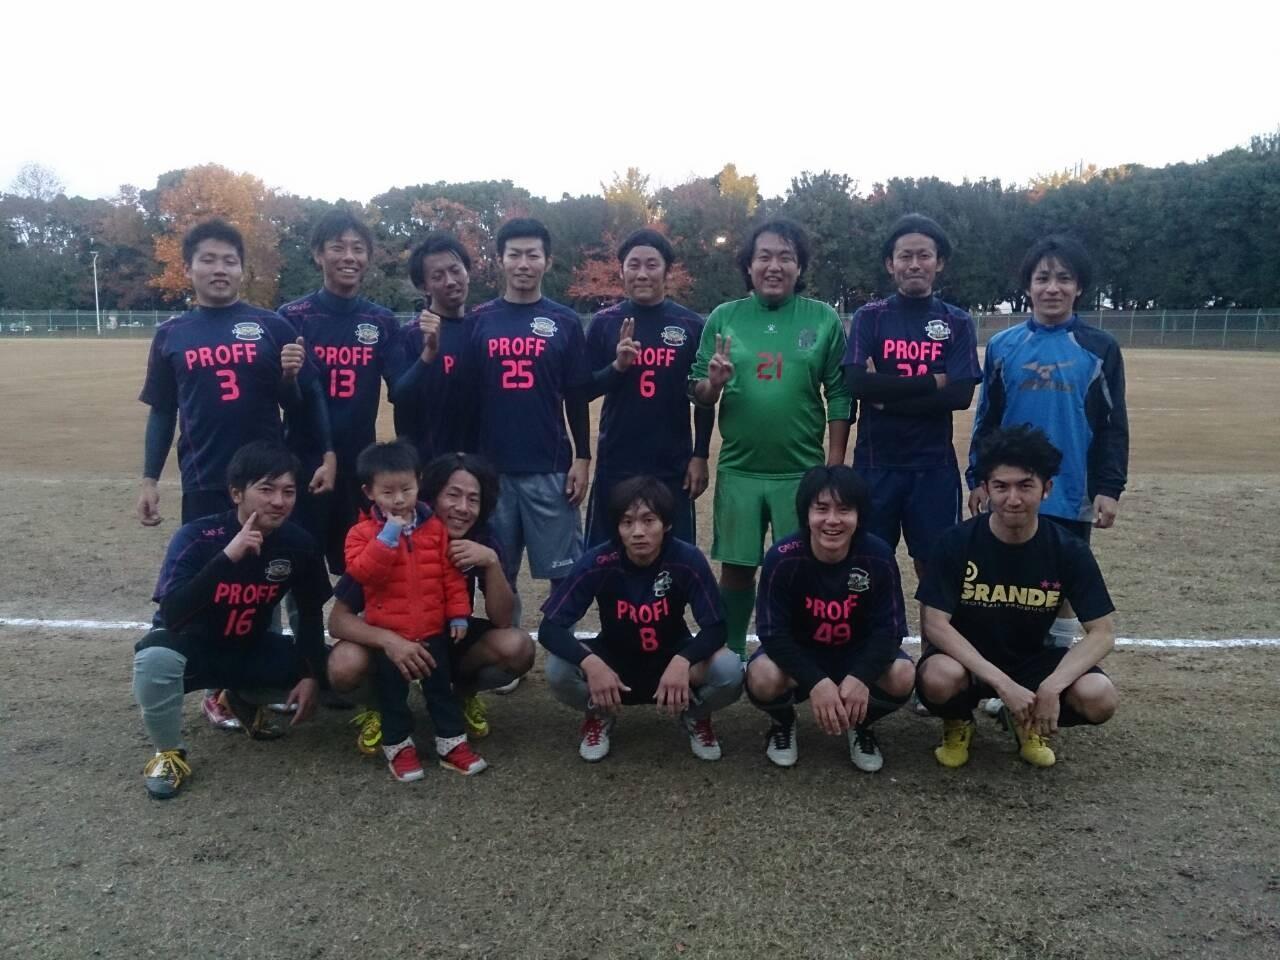 2014/11/23 大泉緑地球技広場 vs FORE:ZA